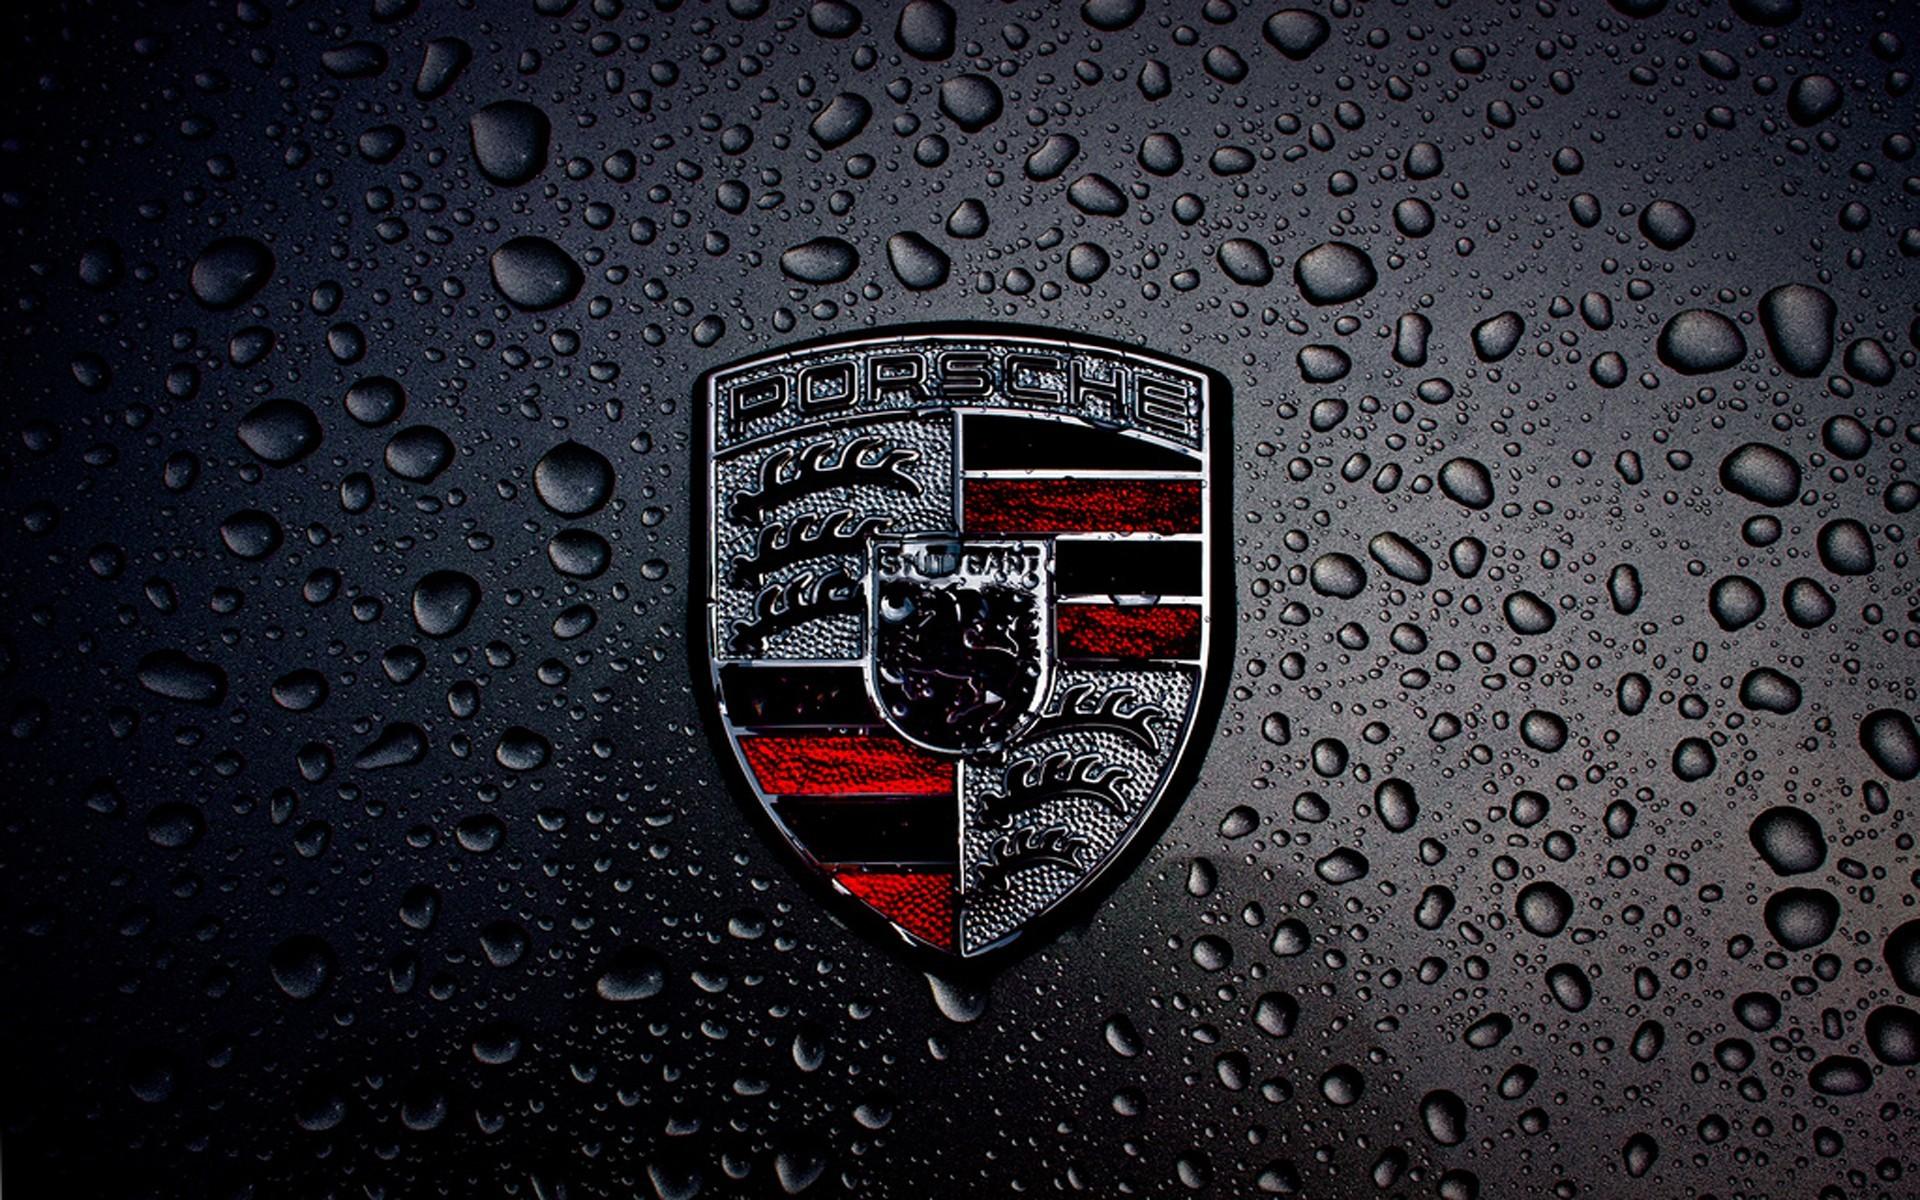 Free Porsche Logo Desktop Wallpaper Picture Download